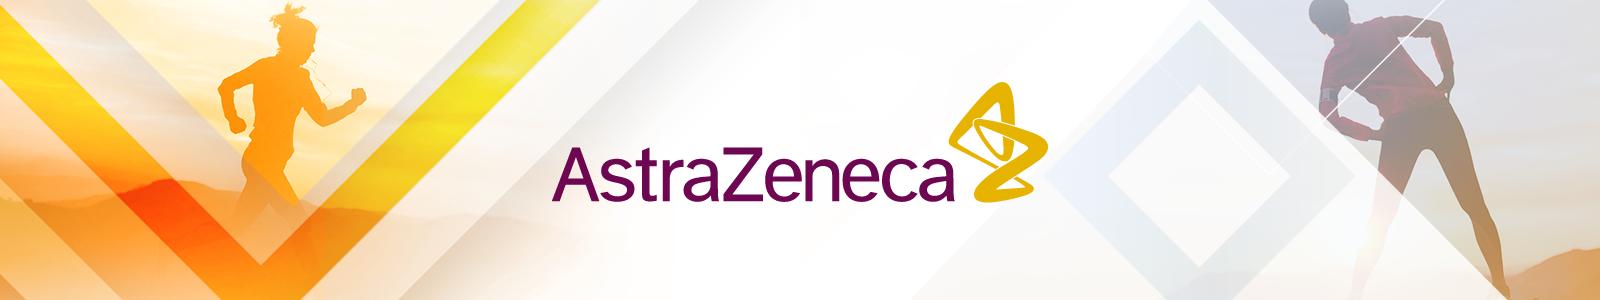 SIEEX-banner-astrazeneca1